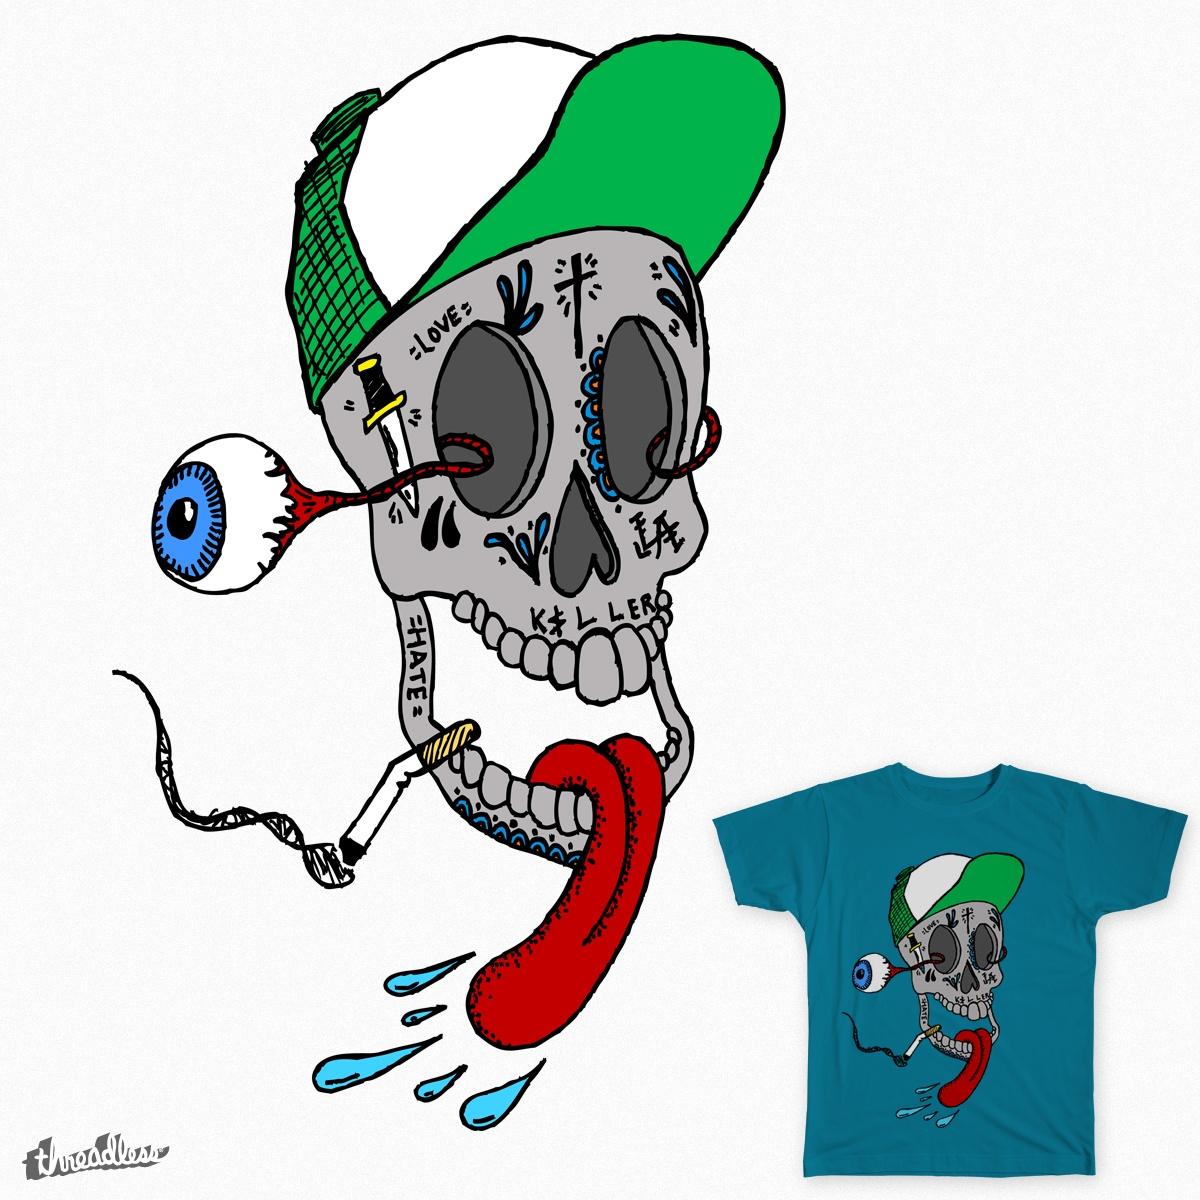 The Gnarliest skull around. by toferthegreat on Threadless